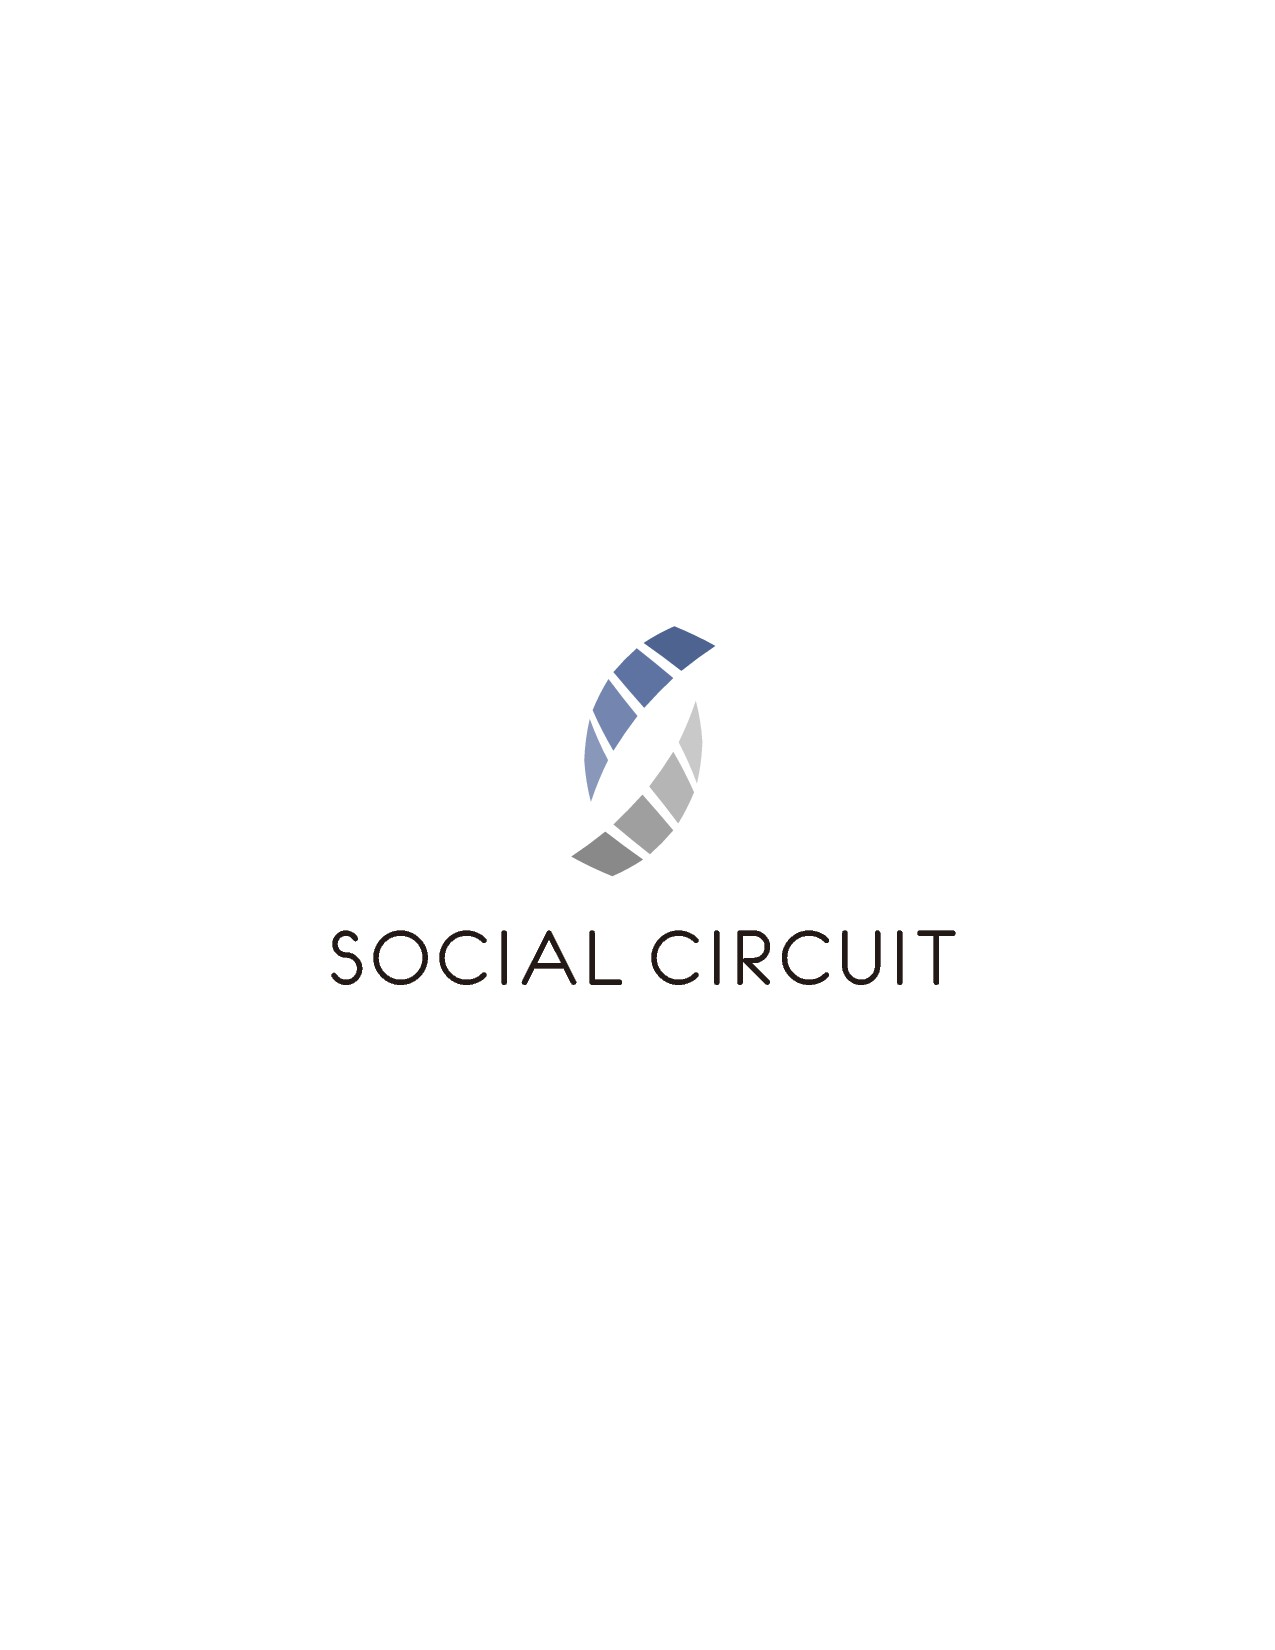 Create a classic logo with a unique twist for a Social Media Company